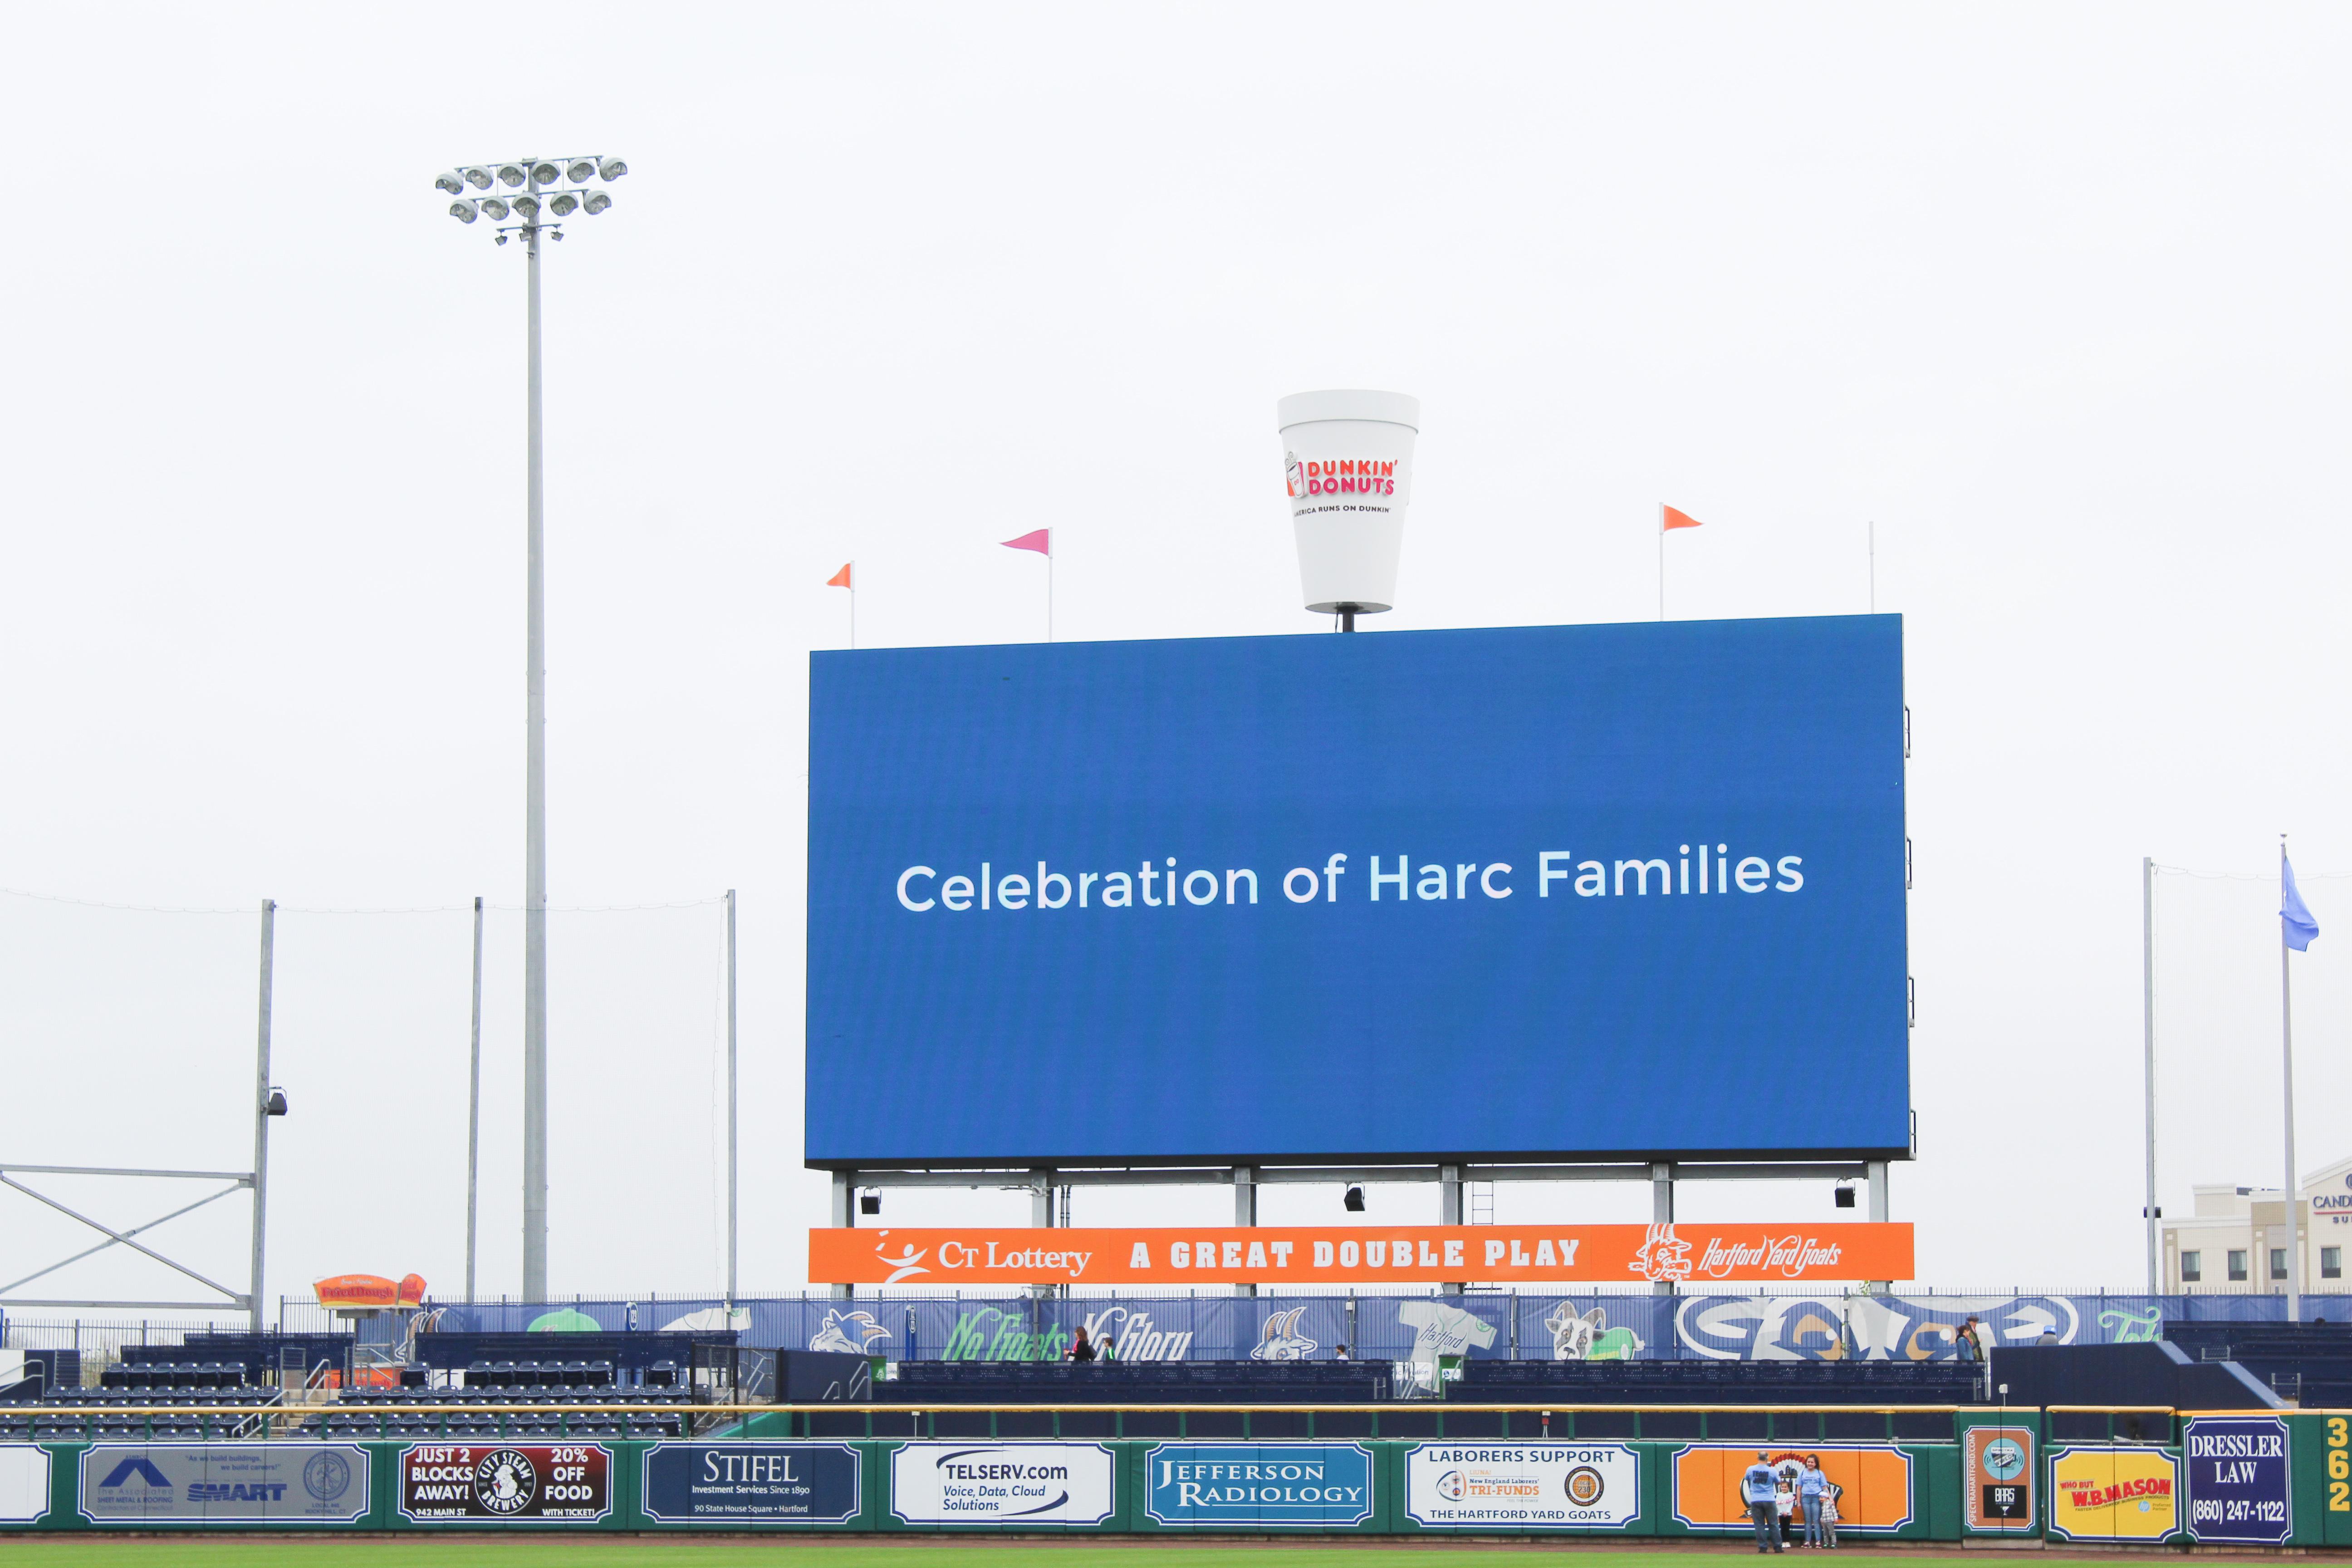 Celebrating family legacies